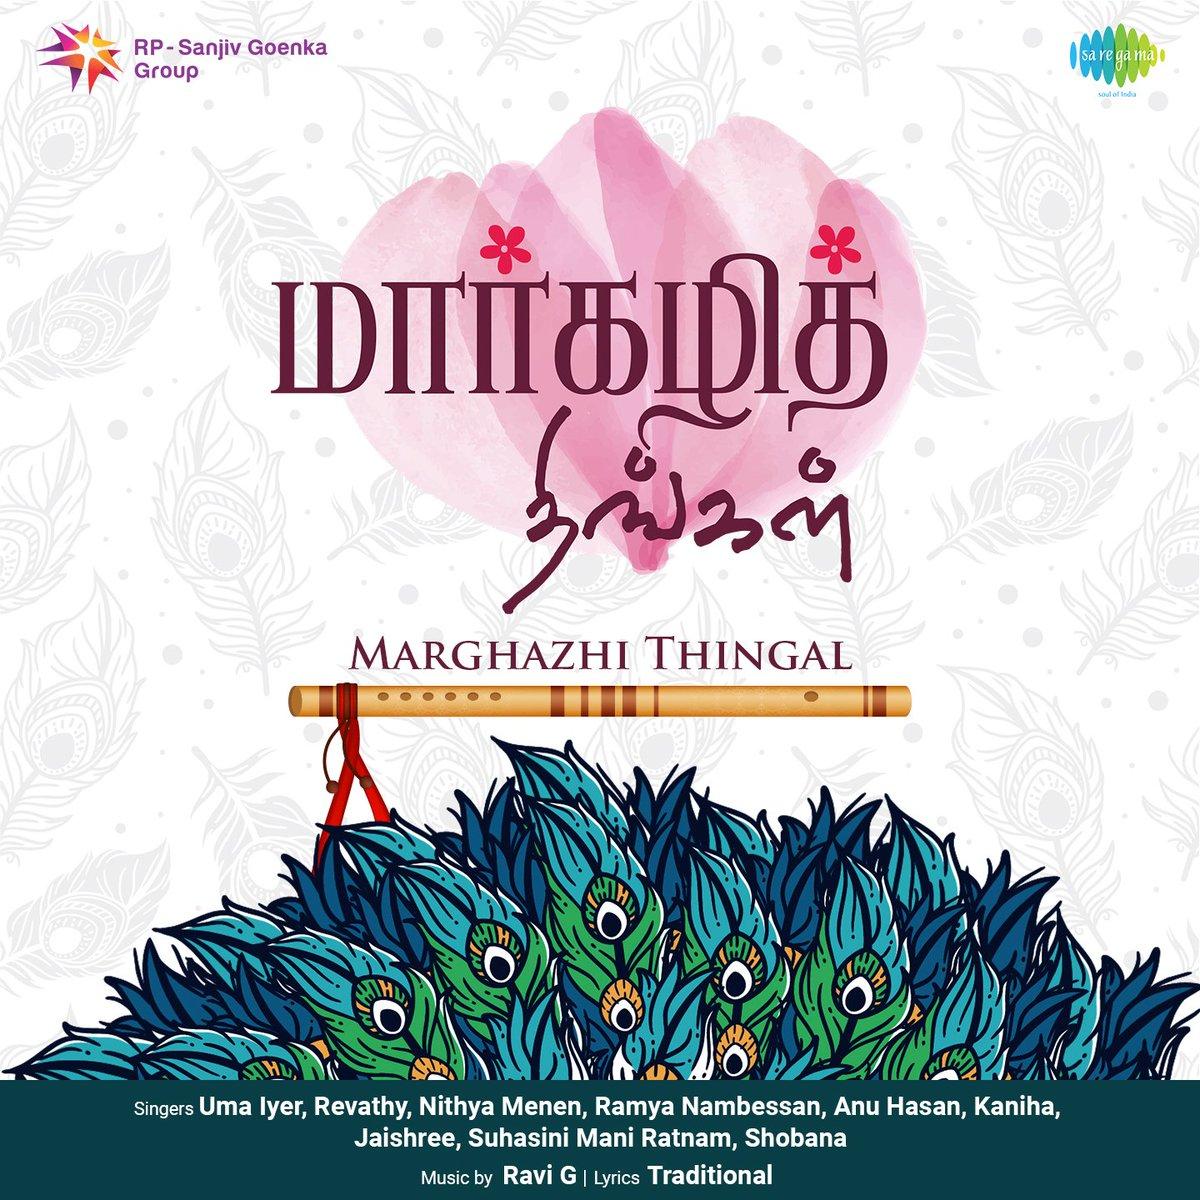 The Spirit of Margazhi 💫  Presenting the #OnePaasuram #MargazhiThingal  🎧  by  @hasinimani #Revathy @MenenNithya @nambessan_ramya #Jaishree #Kaniha @anchoruma @anuhasan01 @ShobanaDanseuse @itissubhasree #RaviG  @MadrasTalkies_